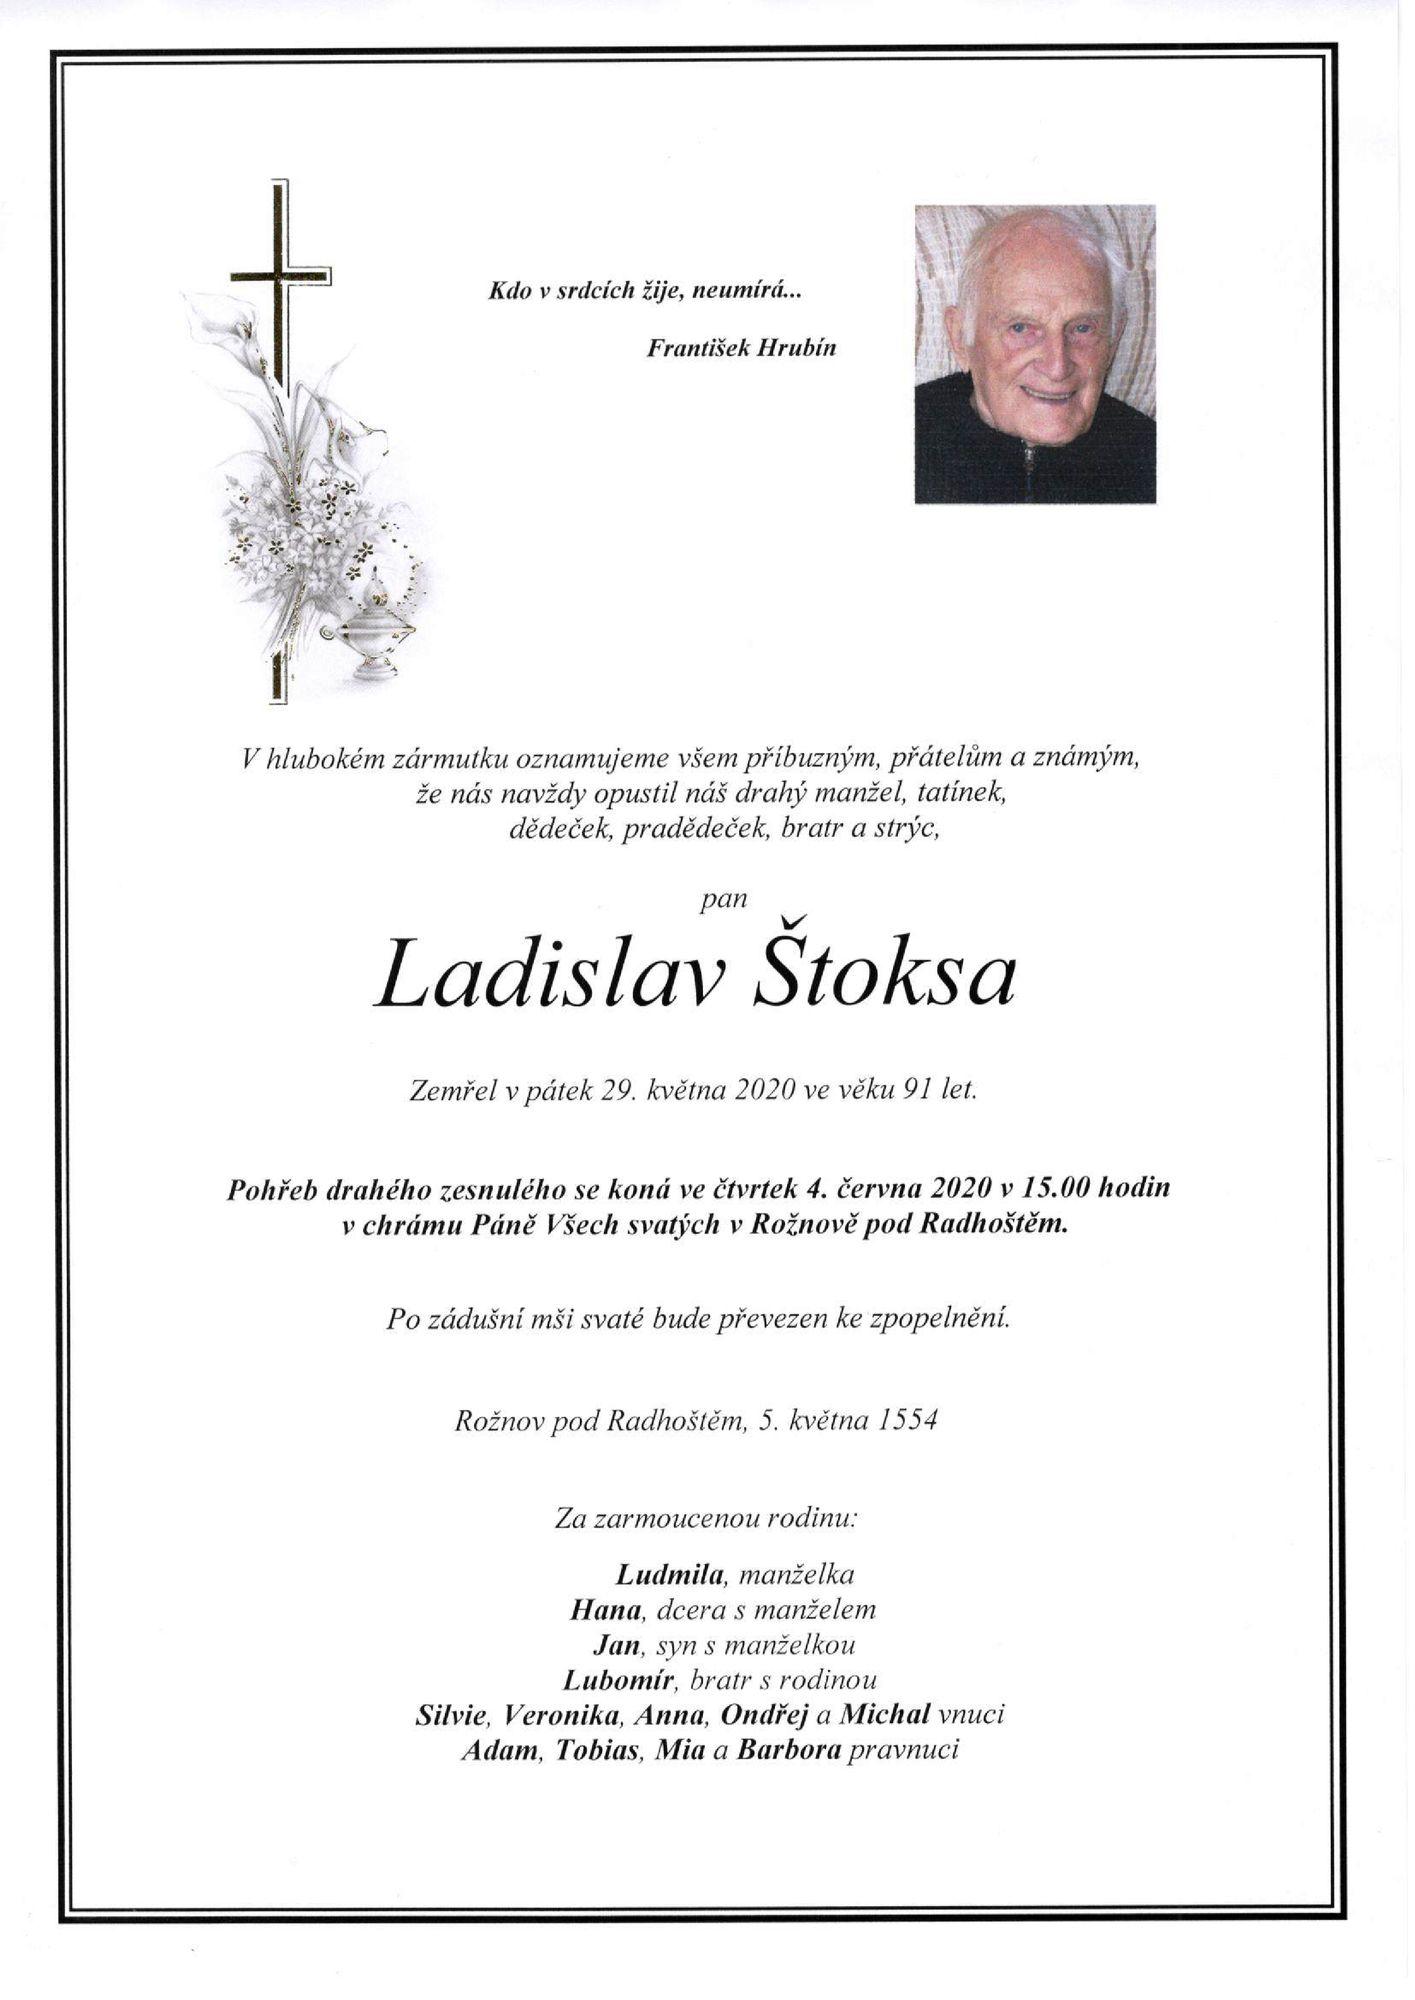 Ladislav Štoksa